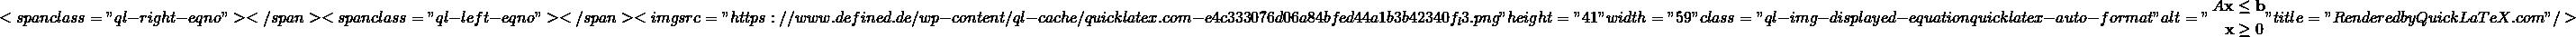 "\[ <span class=""ql-right-eqno"">   </span><span class=""ql-left-eqno"">   </span><img src=""https://www.defined.de/wp-content/ql-cache/quicklatex.com-e4c333076d06a84bfed44a1b3b42340f_l3.png"" height=""41"" width=""59"" class=""ql-img-displayed-equation quicklatex-auto-format"" alt=""\begin{align*} A \mathbf{x} &\leq \mathbf{b} \\ \mathbf{x} &\geq 0 \end{align*}"" title=""Rendered by QuickLaTeX.com""/> \]"